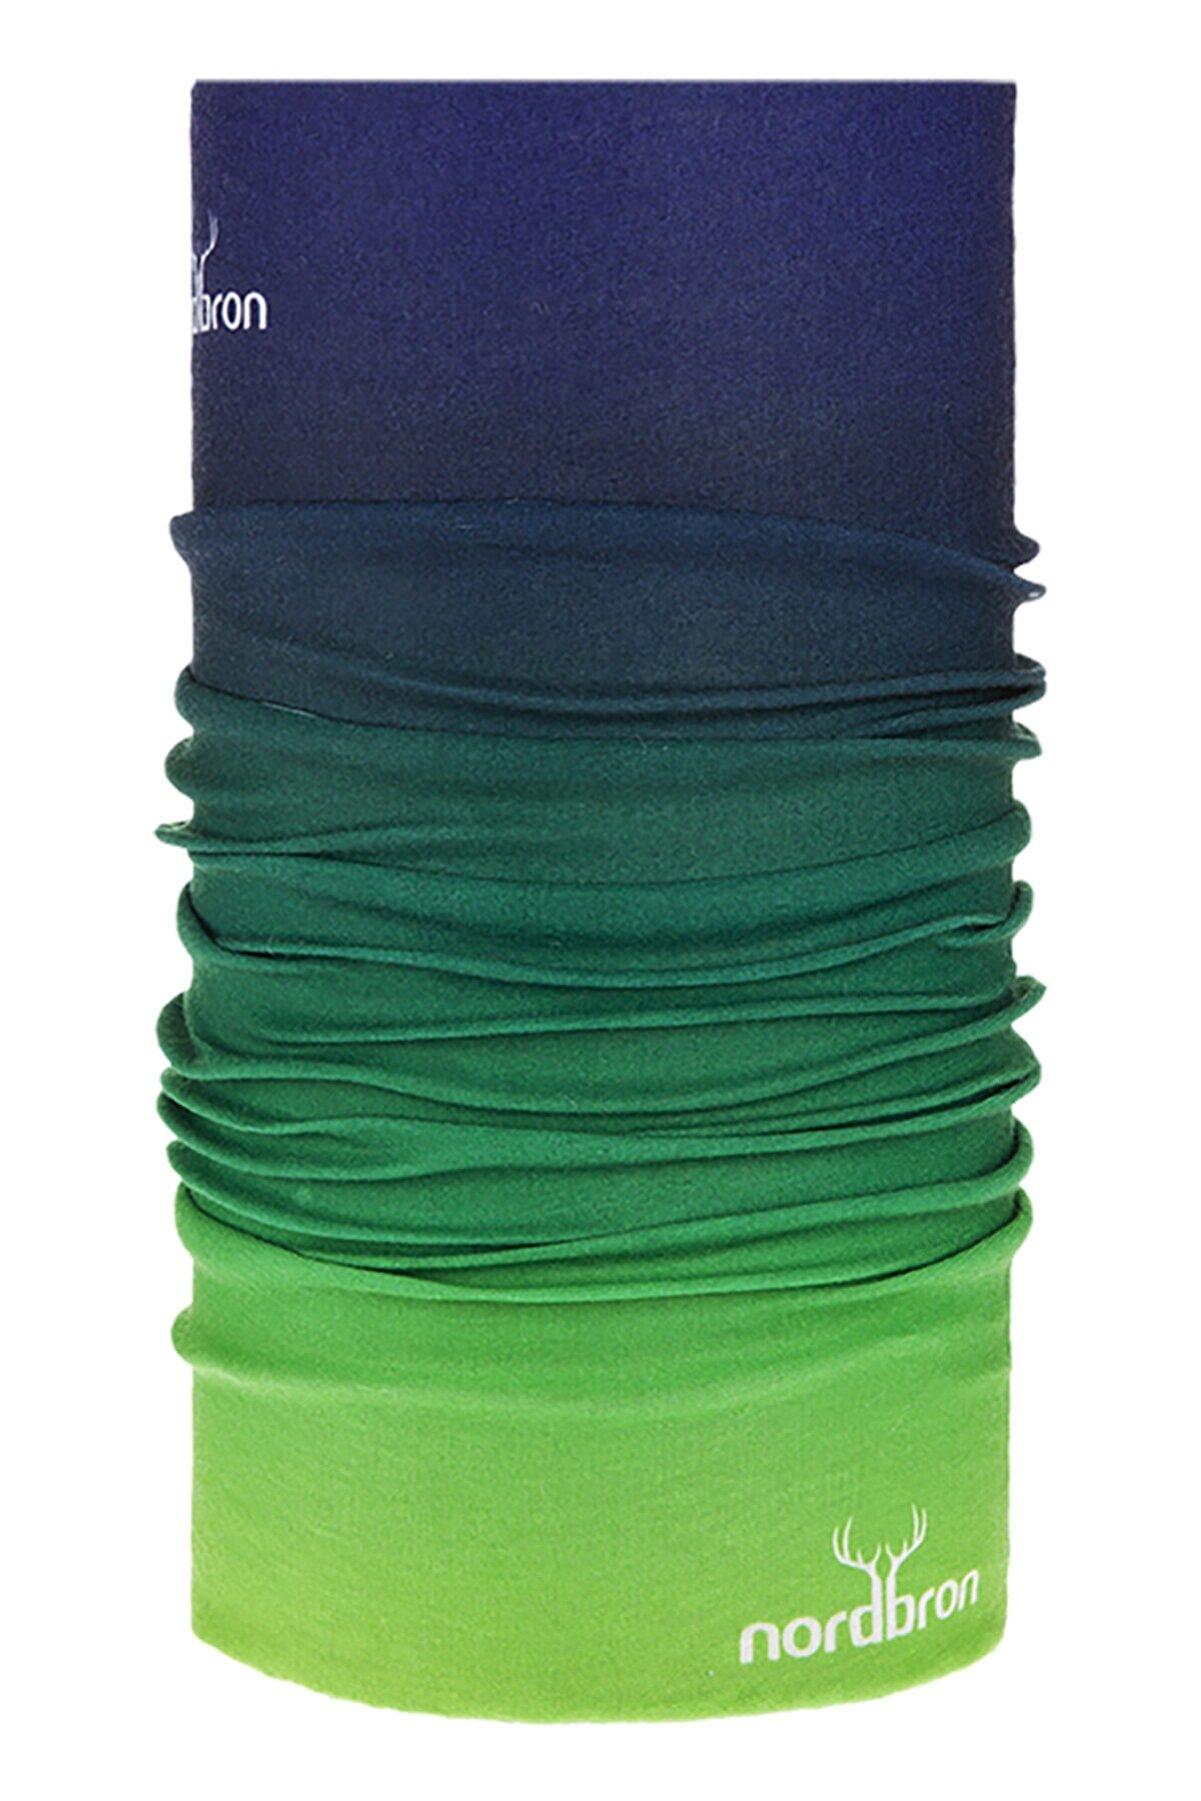 Nordbron Dip Dyed - Classic Green Bandana Maske Yüz ve Kafa Bandı Balaklava Boyunluk Dikişsiz